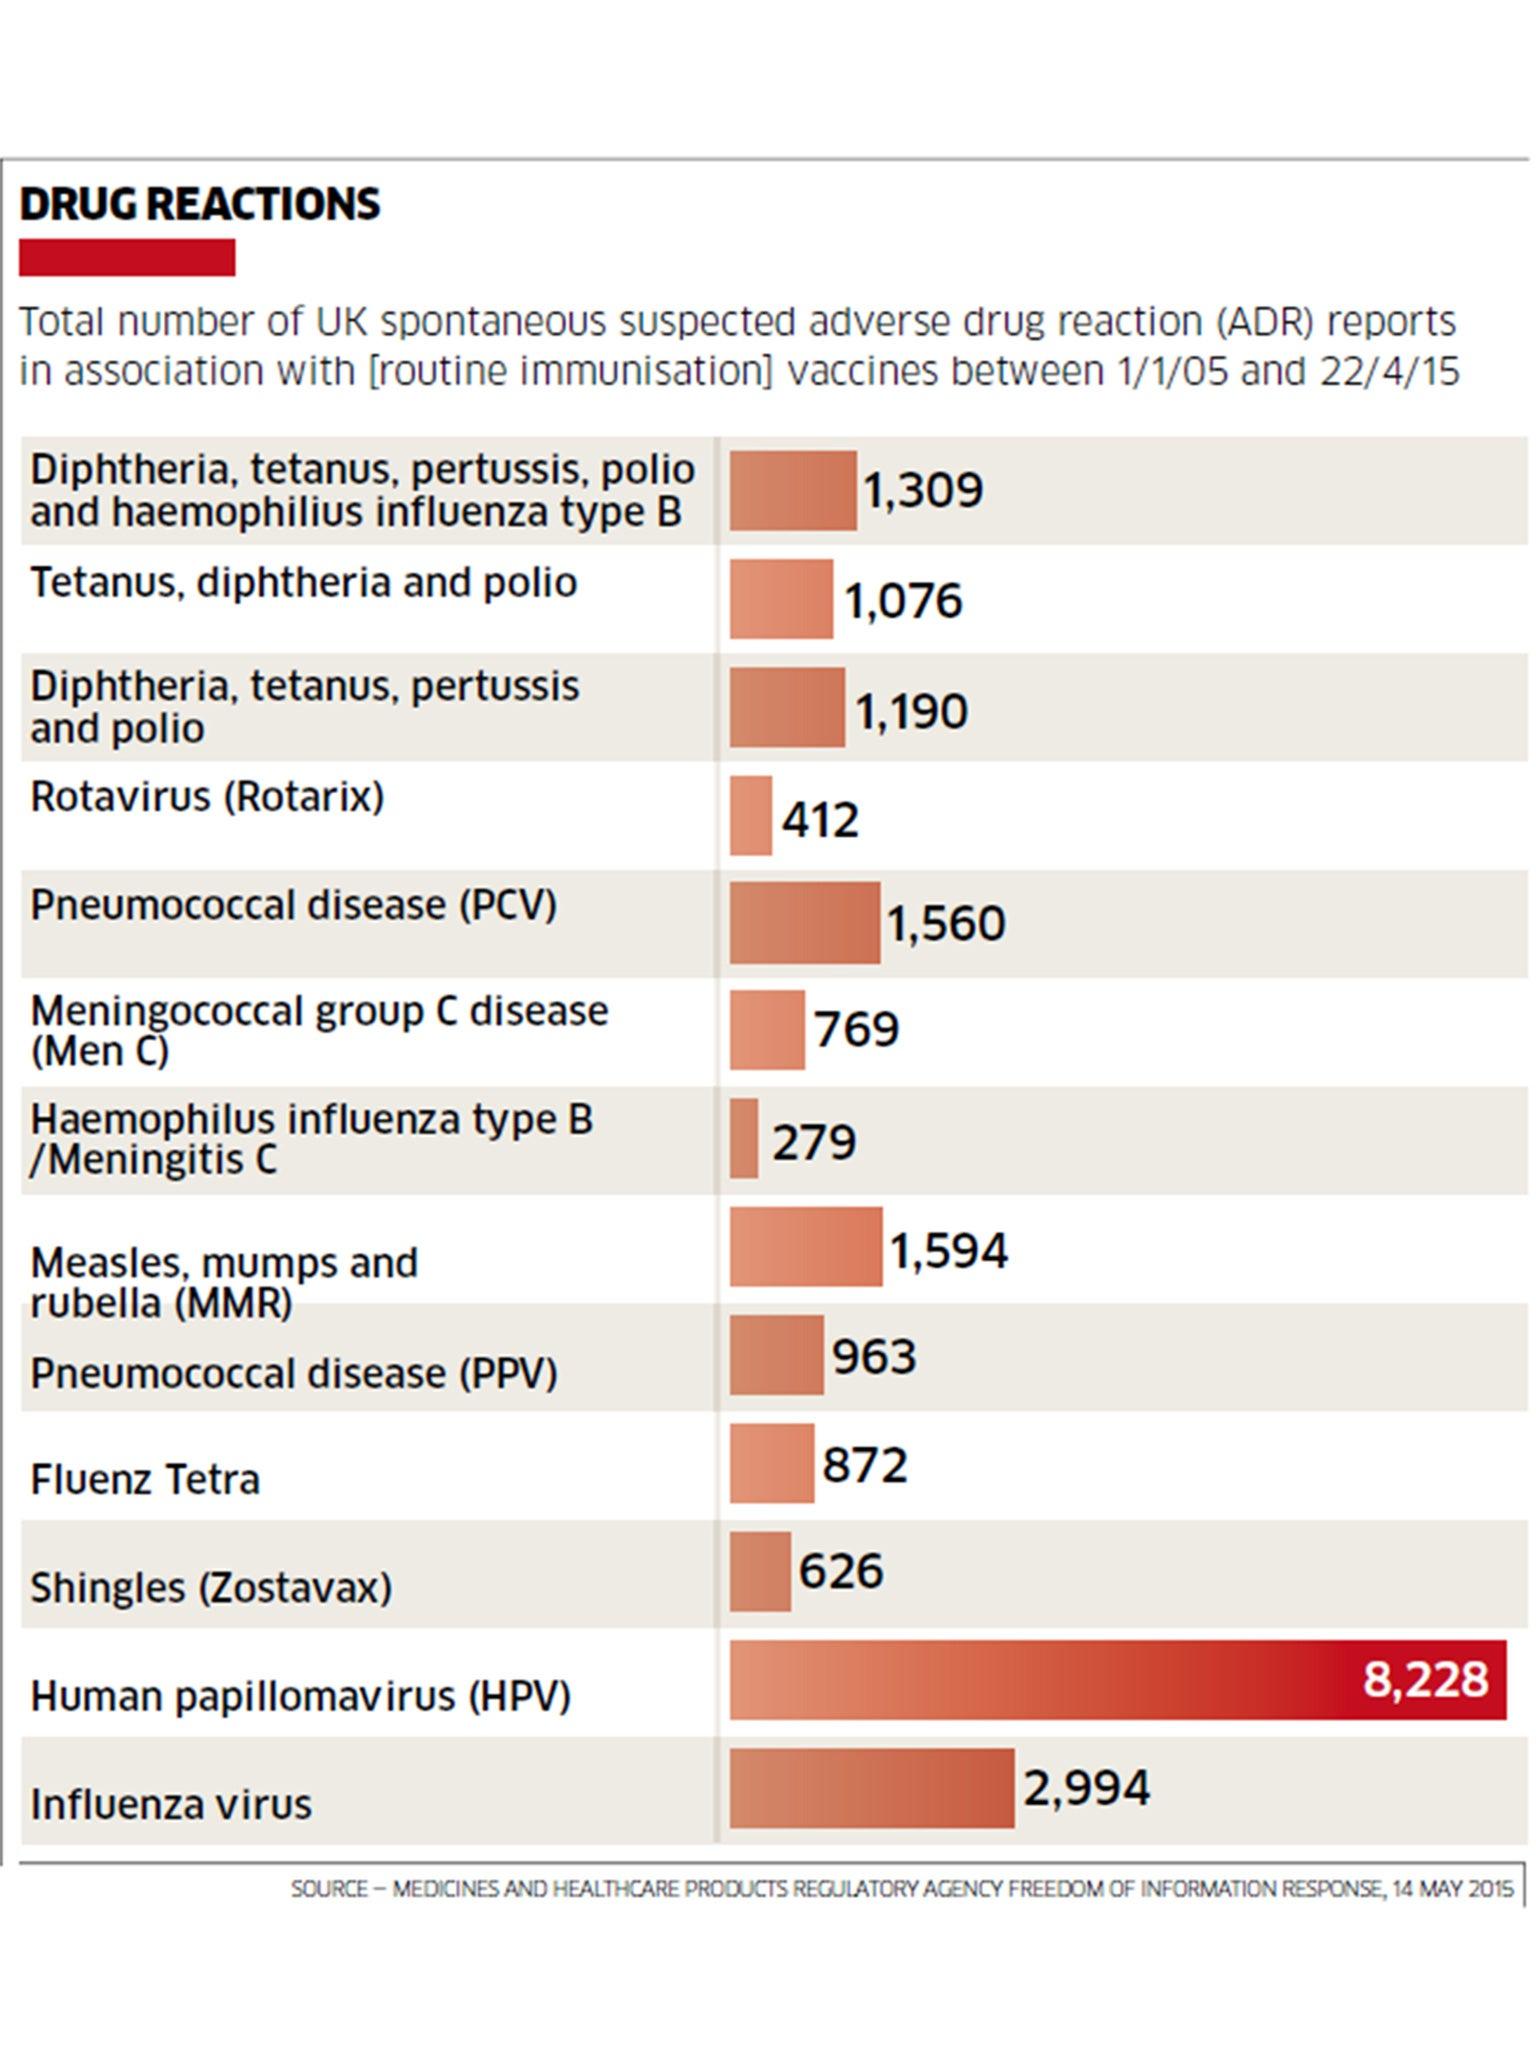 Human papillomavirus vaccine fertility, Does the human papillomavirus vaccine hurt